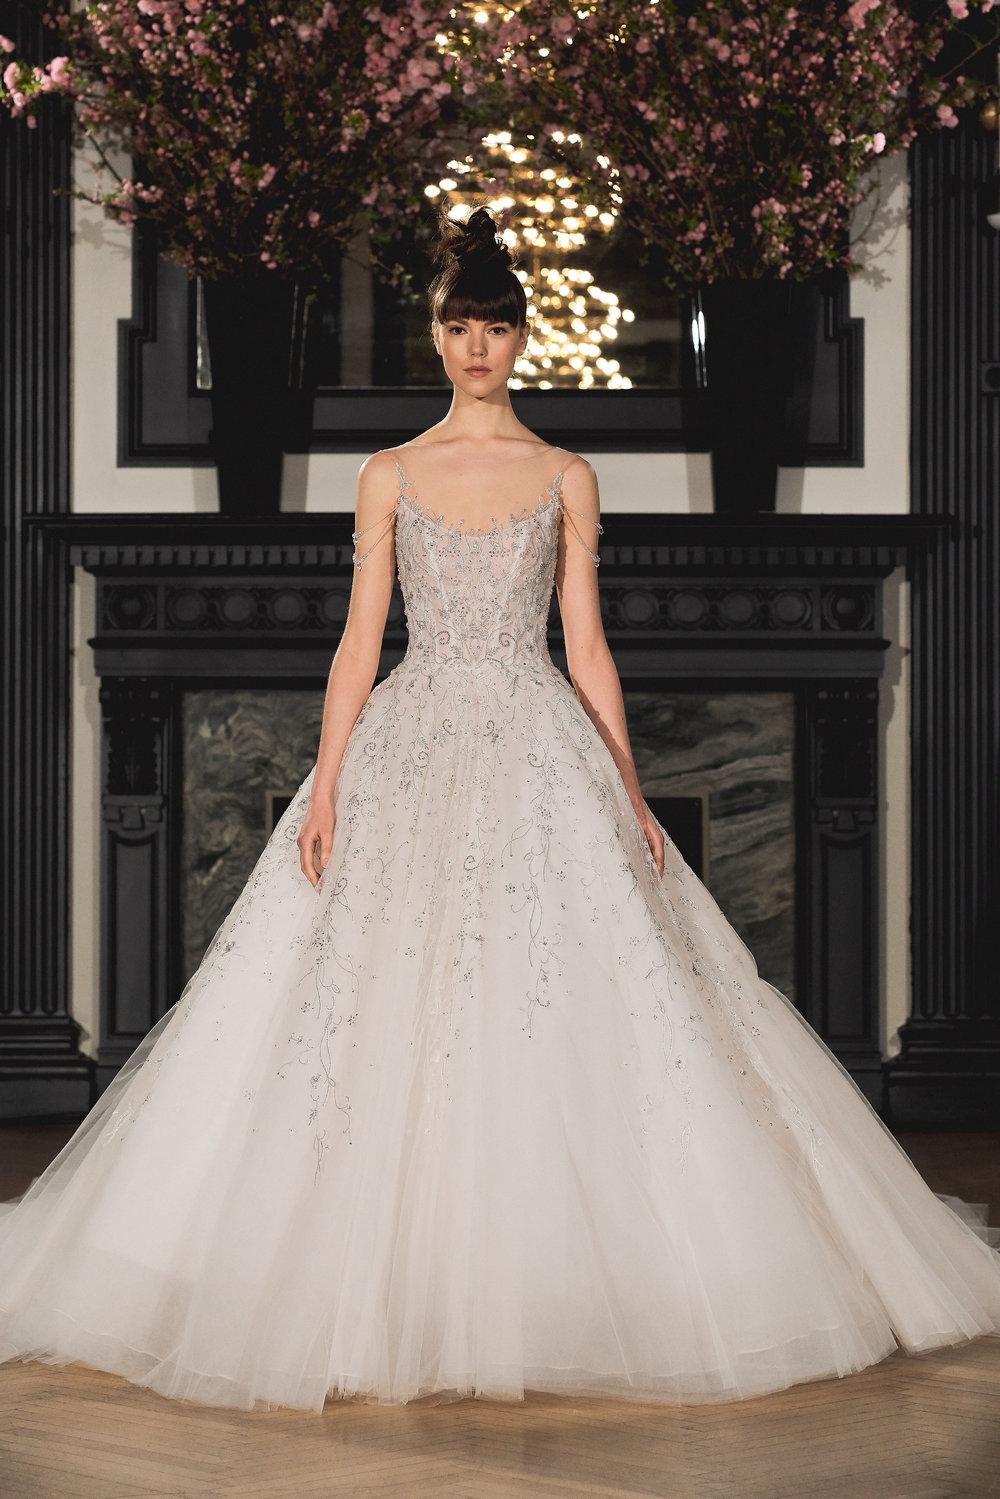 Bridal Spring 2019 Couture   SERENITY    INQUIRE